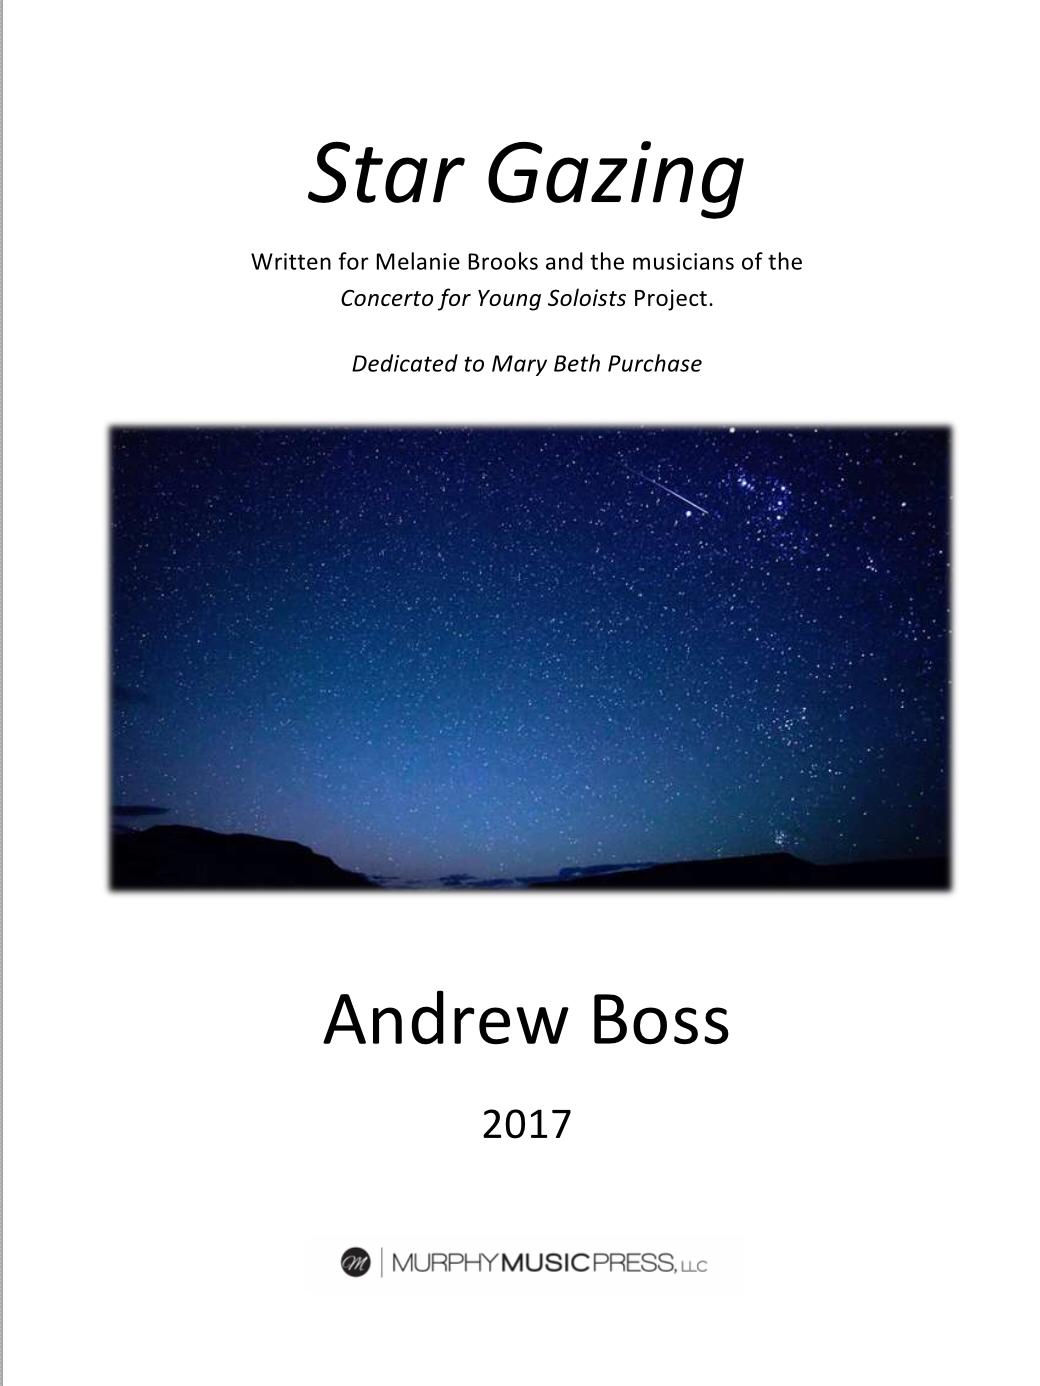 Stargazing by Andrew Boss